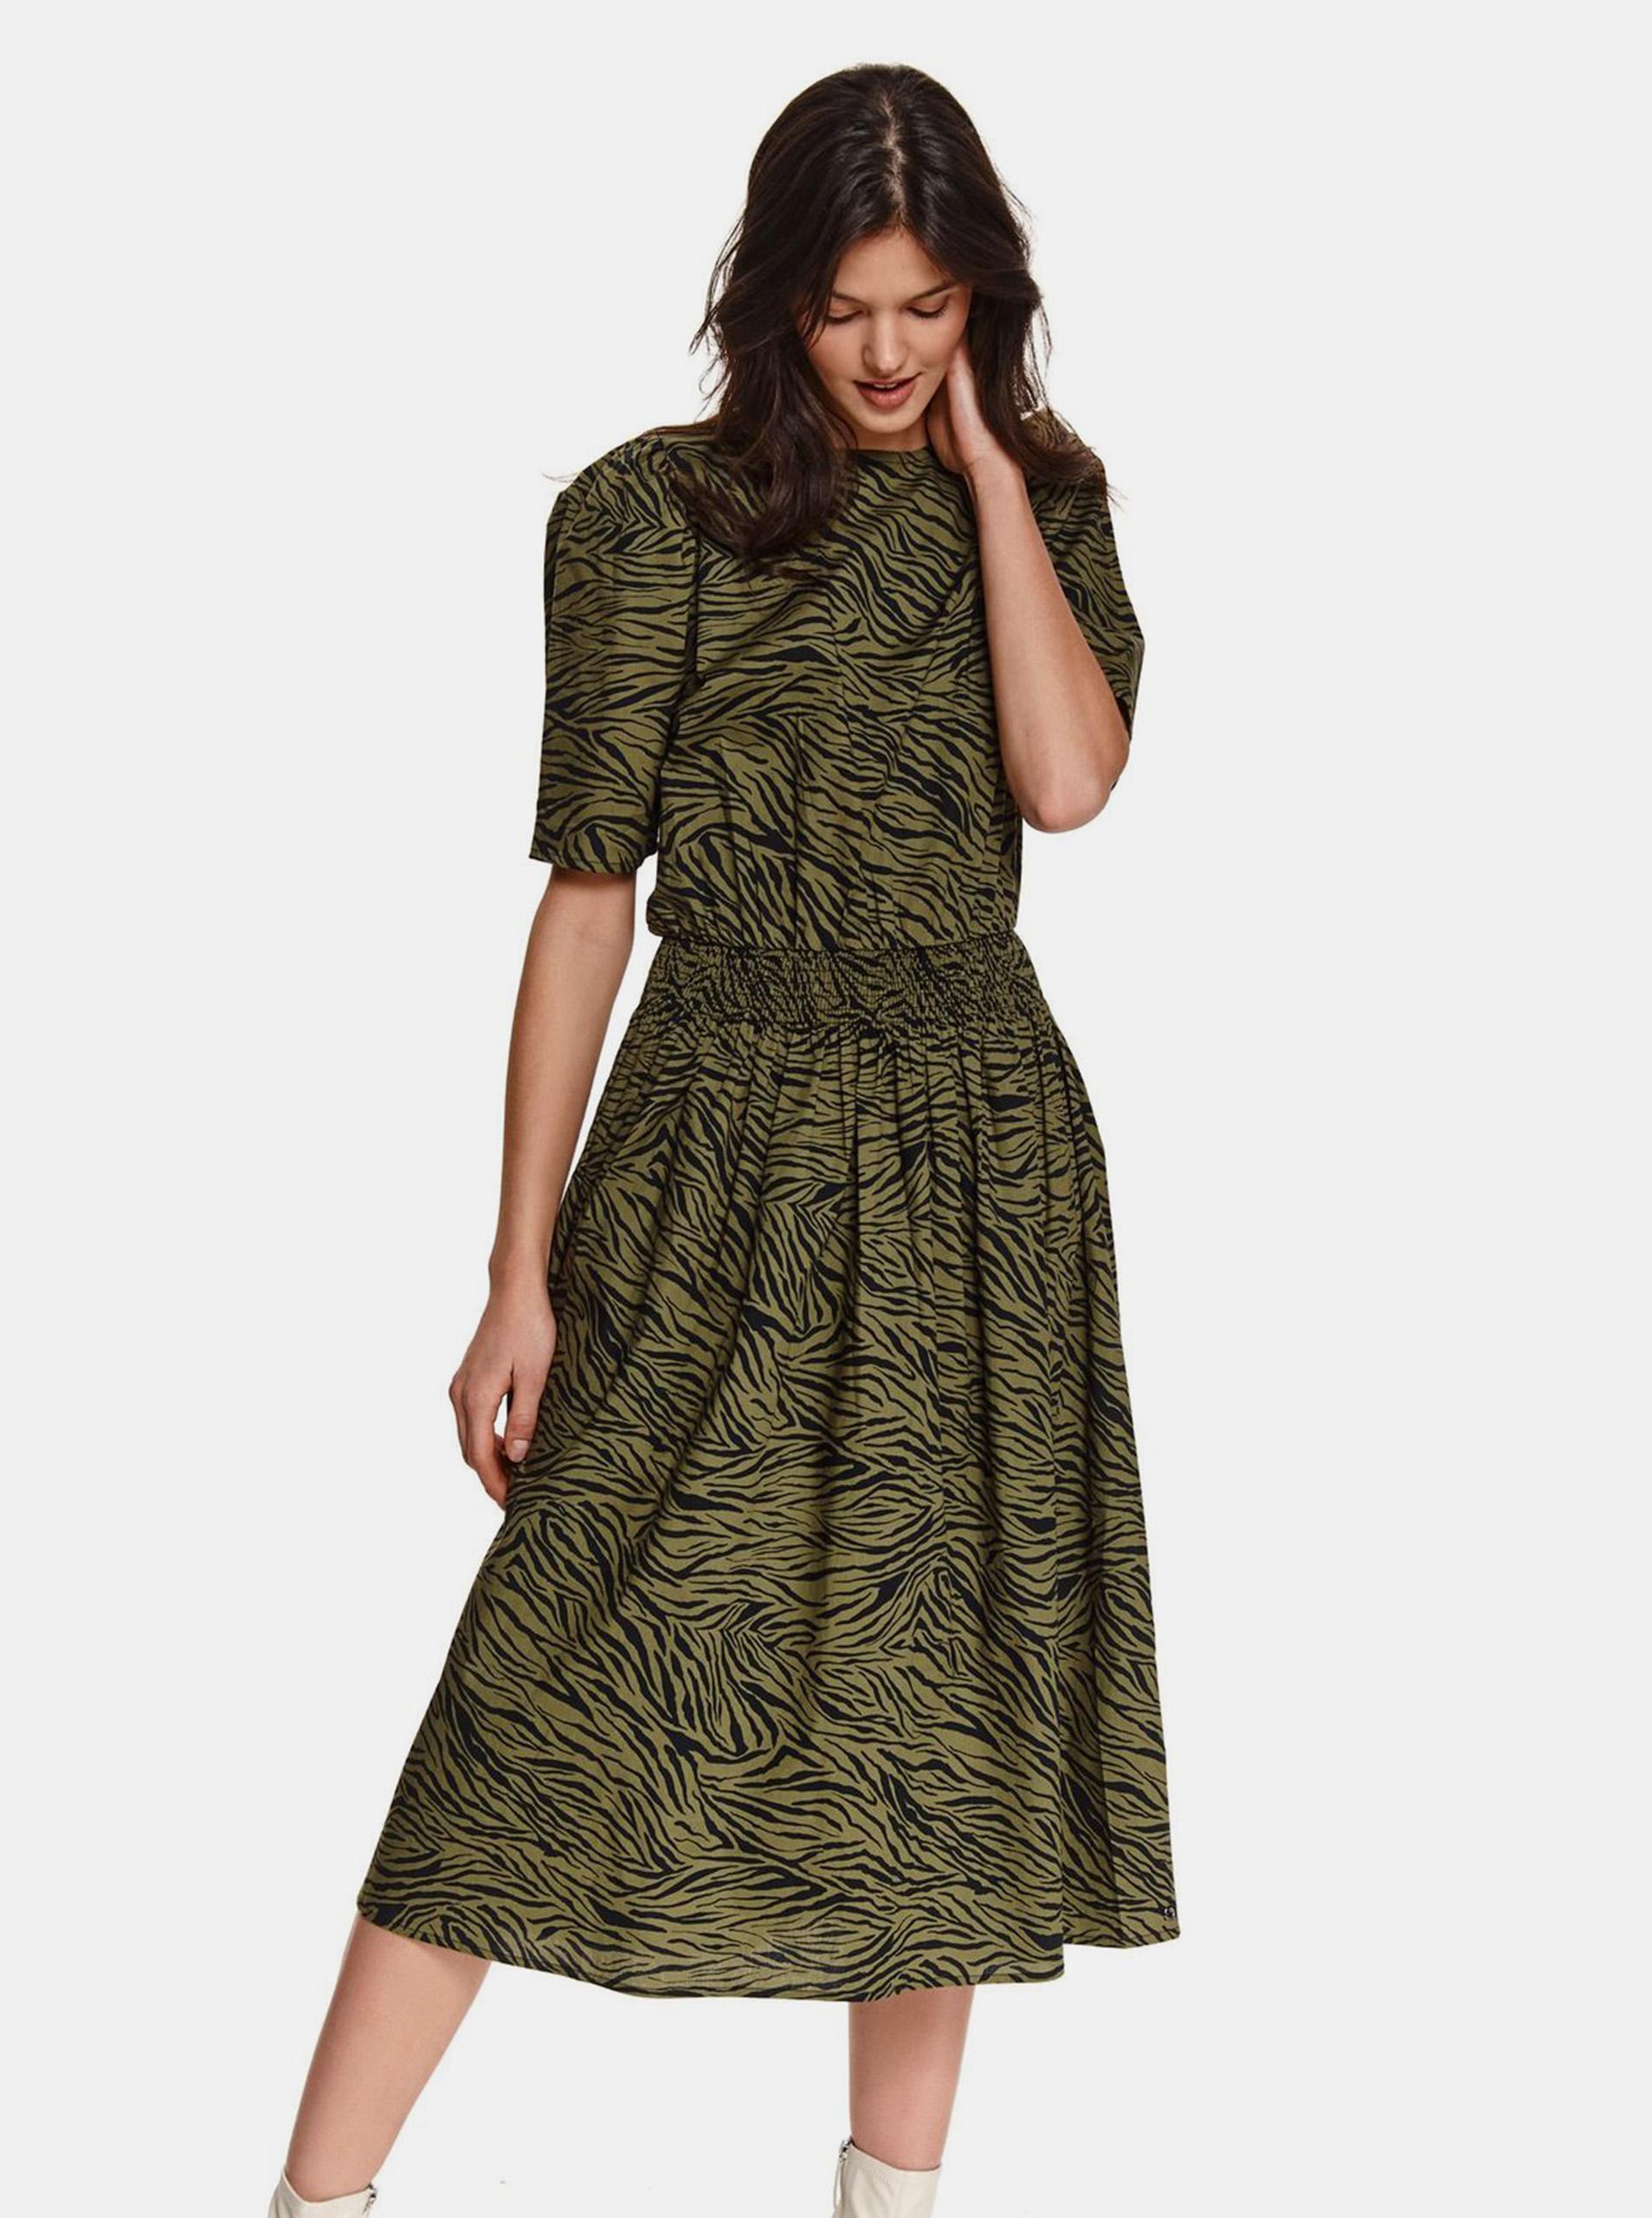 TOP SECRET green midi dress patterned